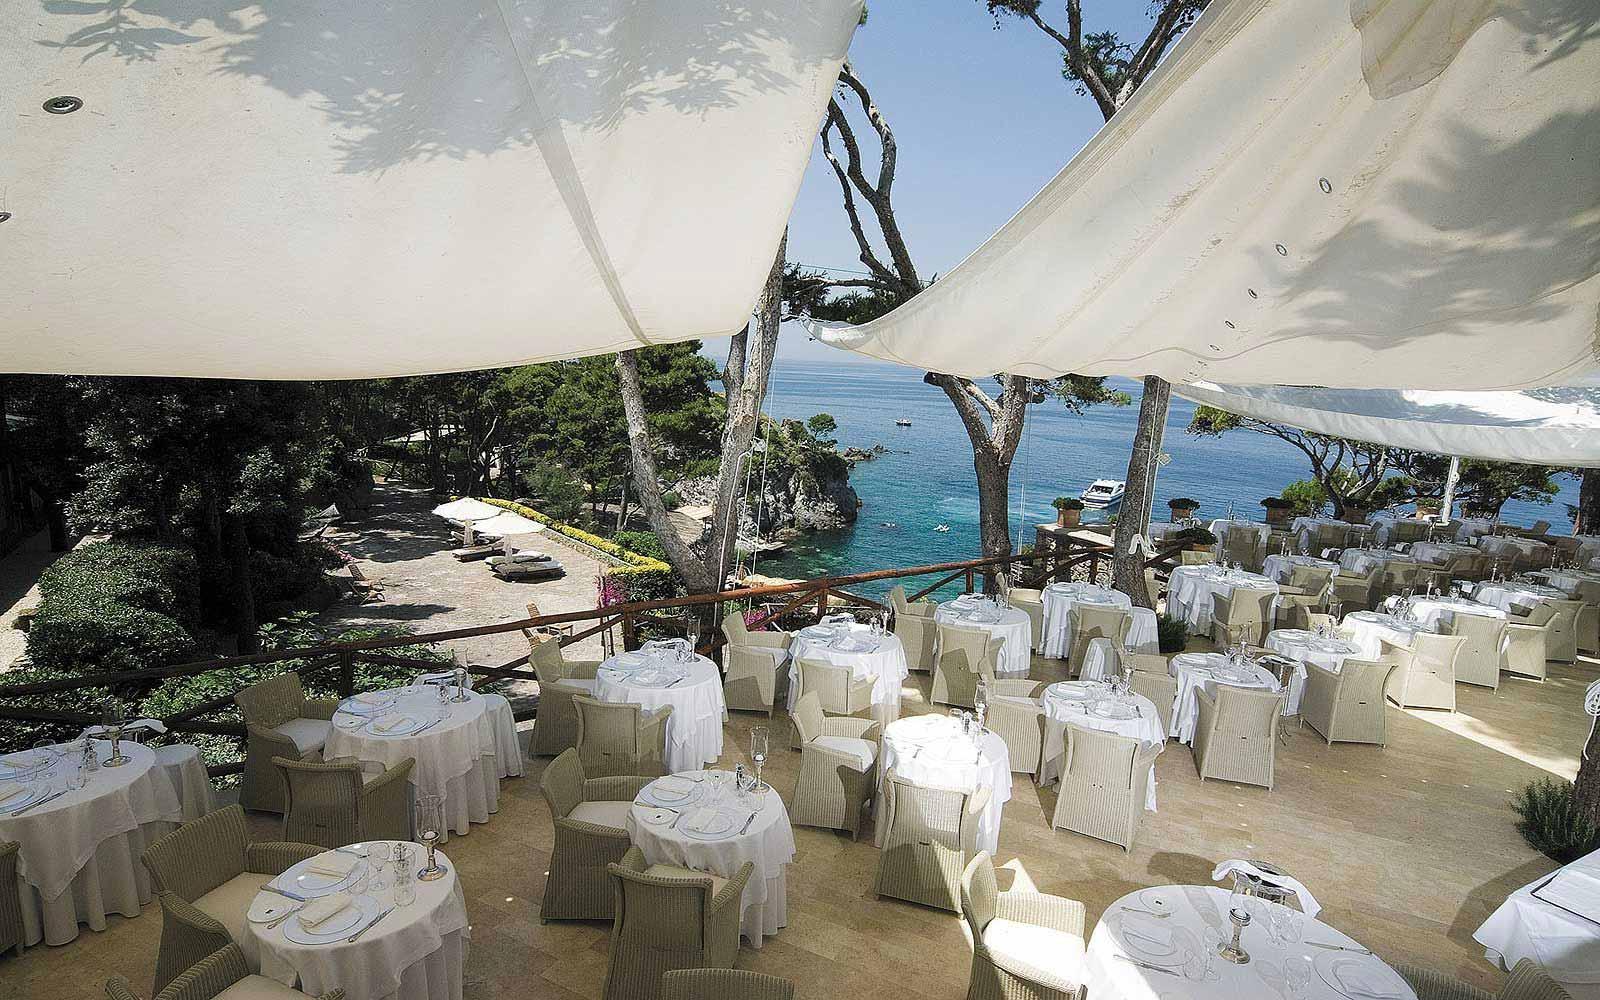 Chandelier Restaurant outdoors at Mezzatorre Resort & Spa